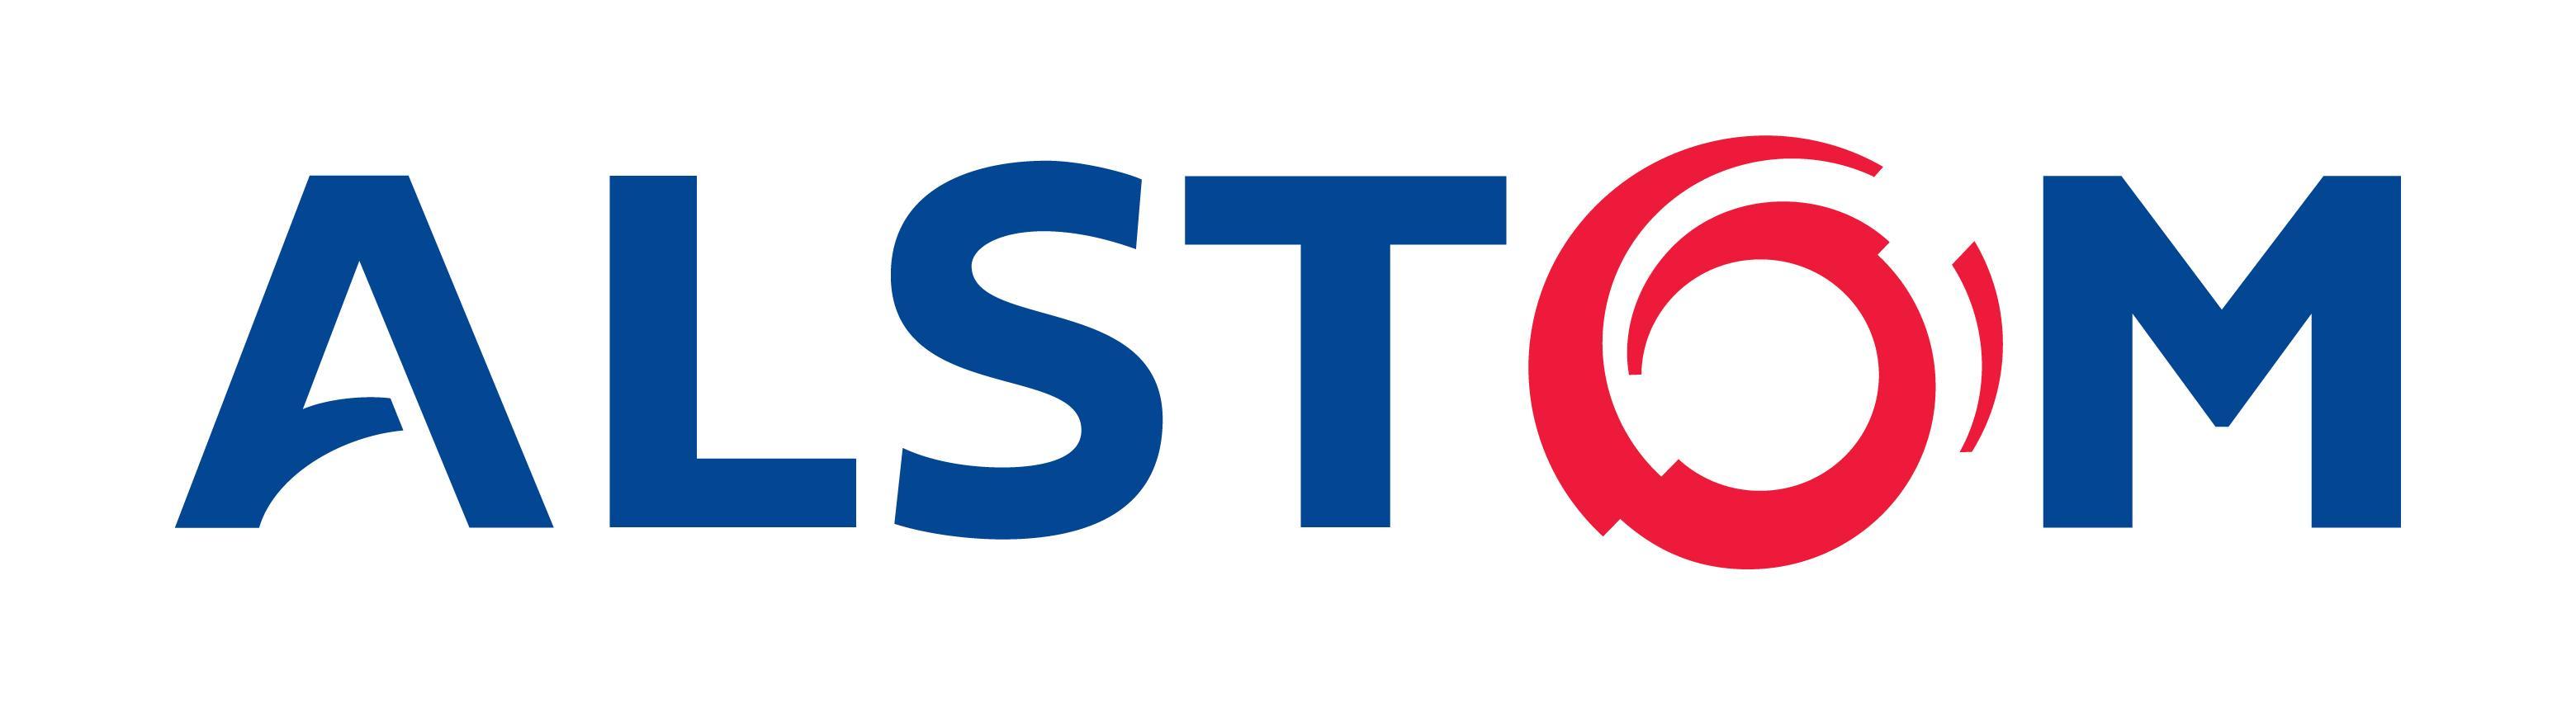 Transportation Company - Alstom - Railroad Equipment